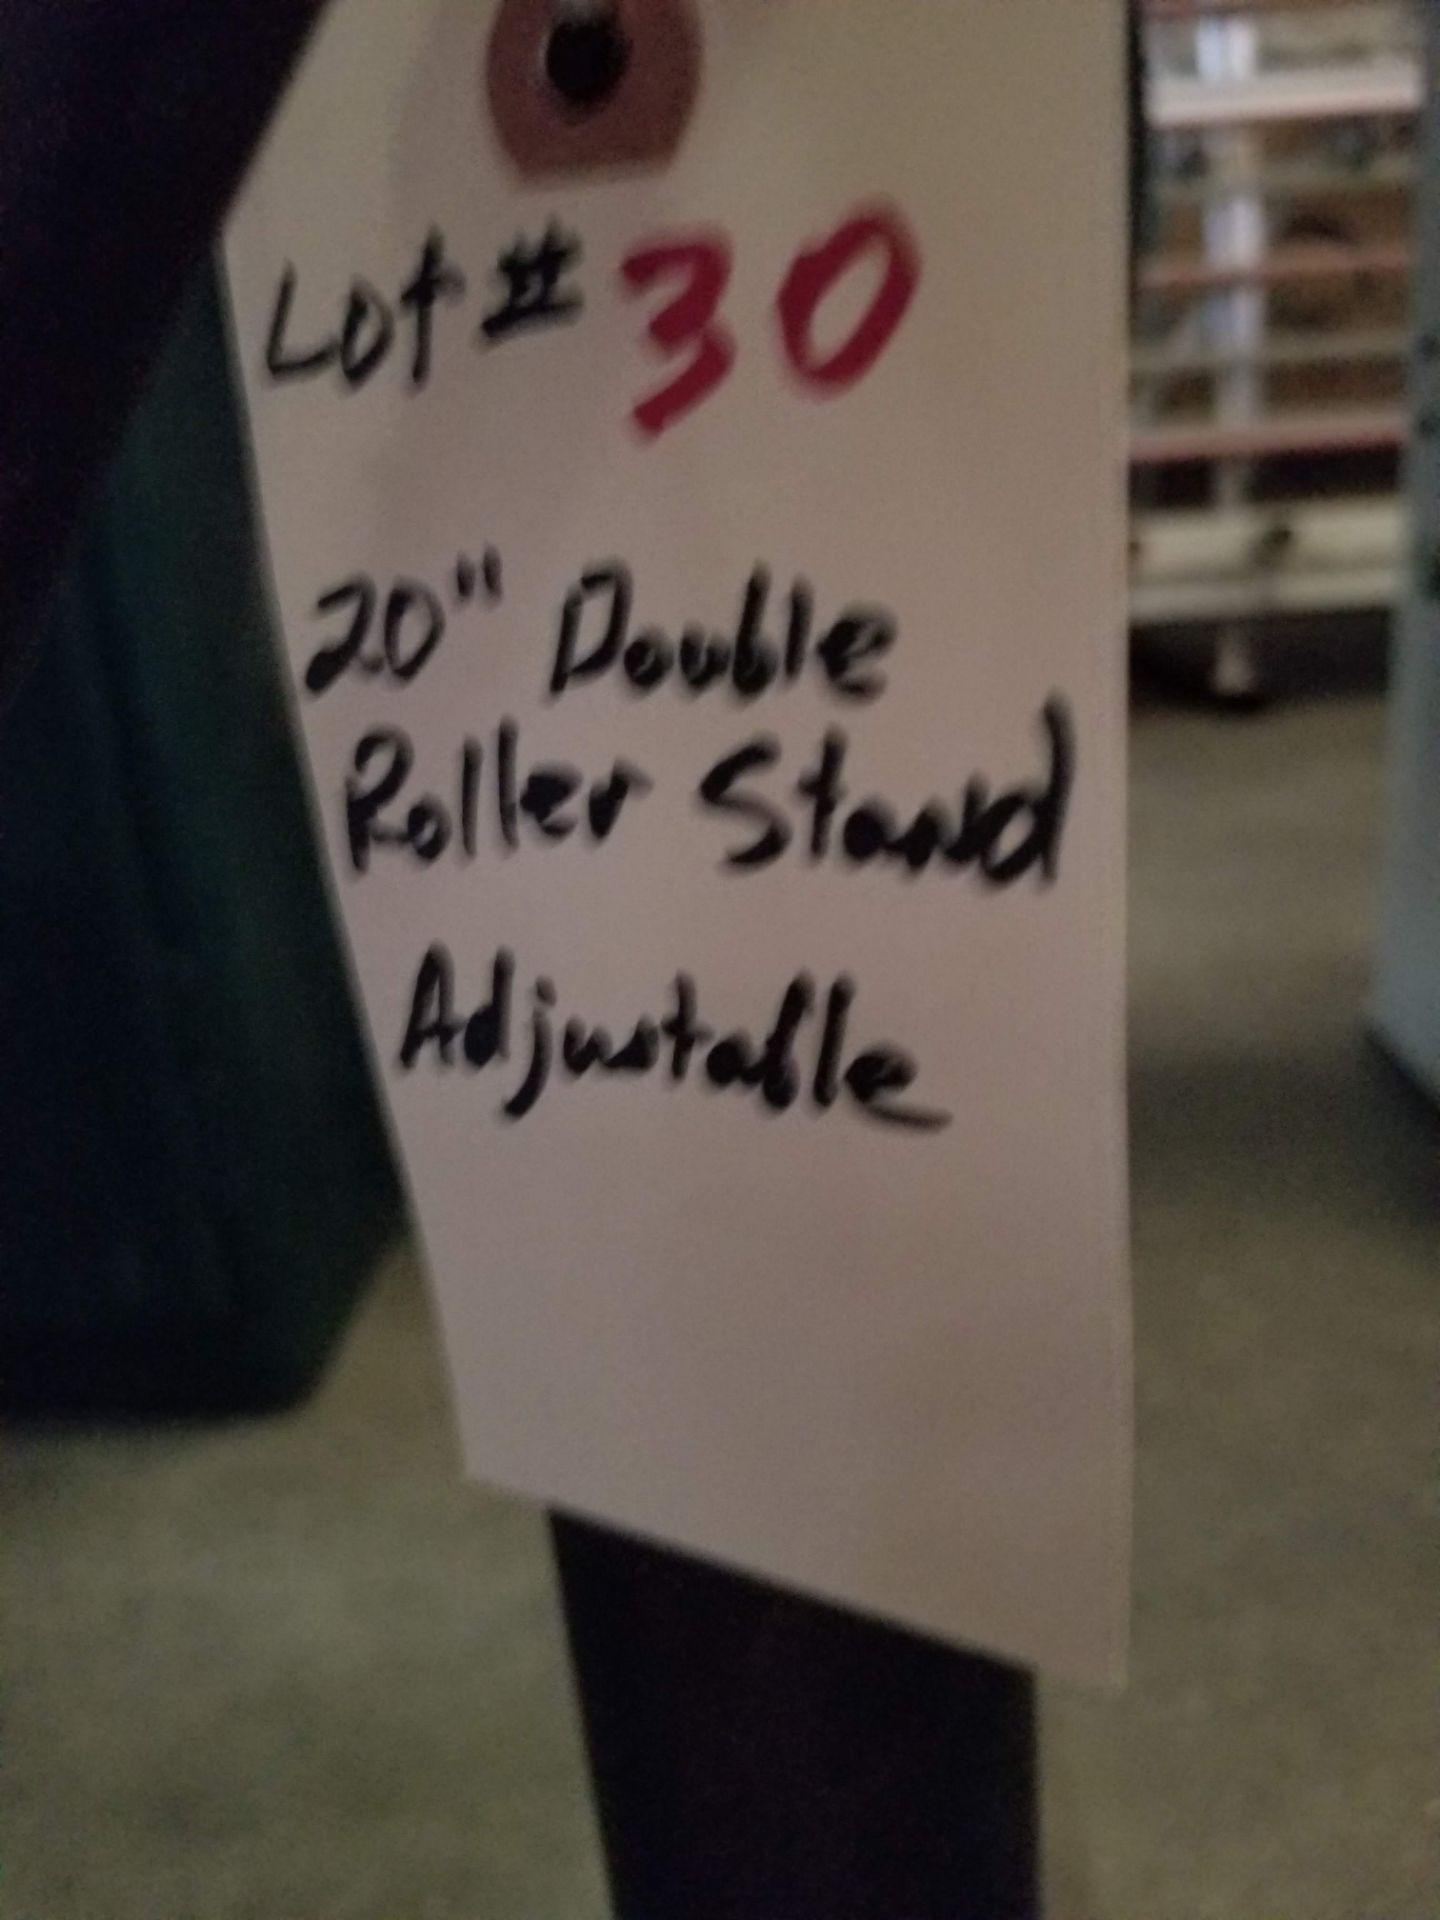 "Lot 30 - 20"" Double Roller Strand Adjustable"